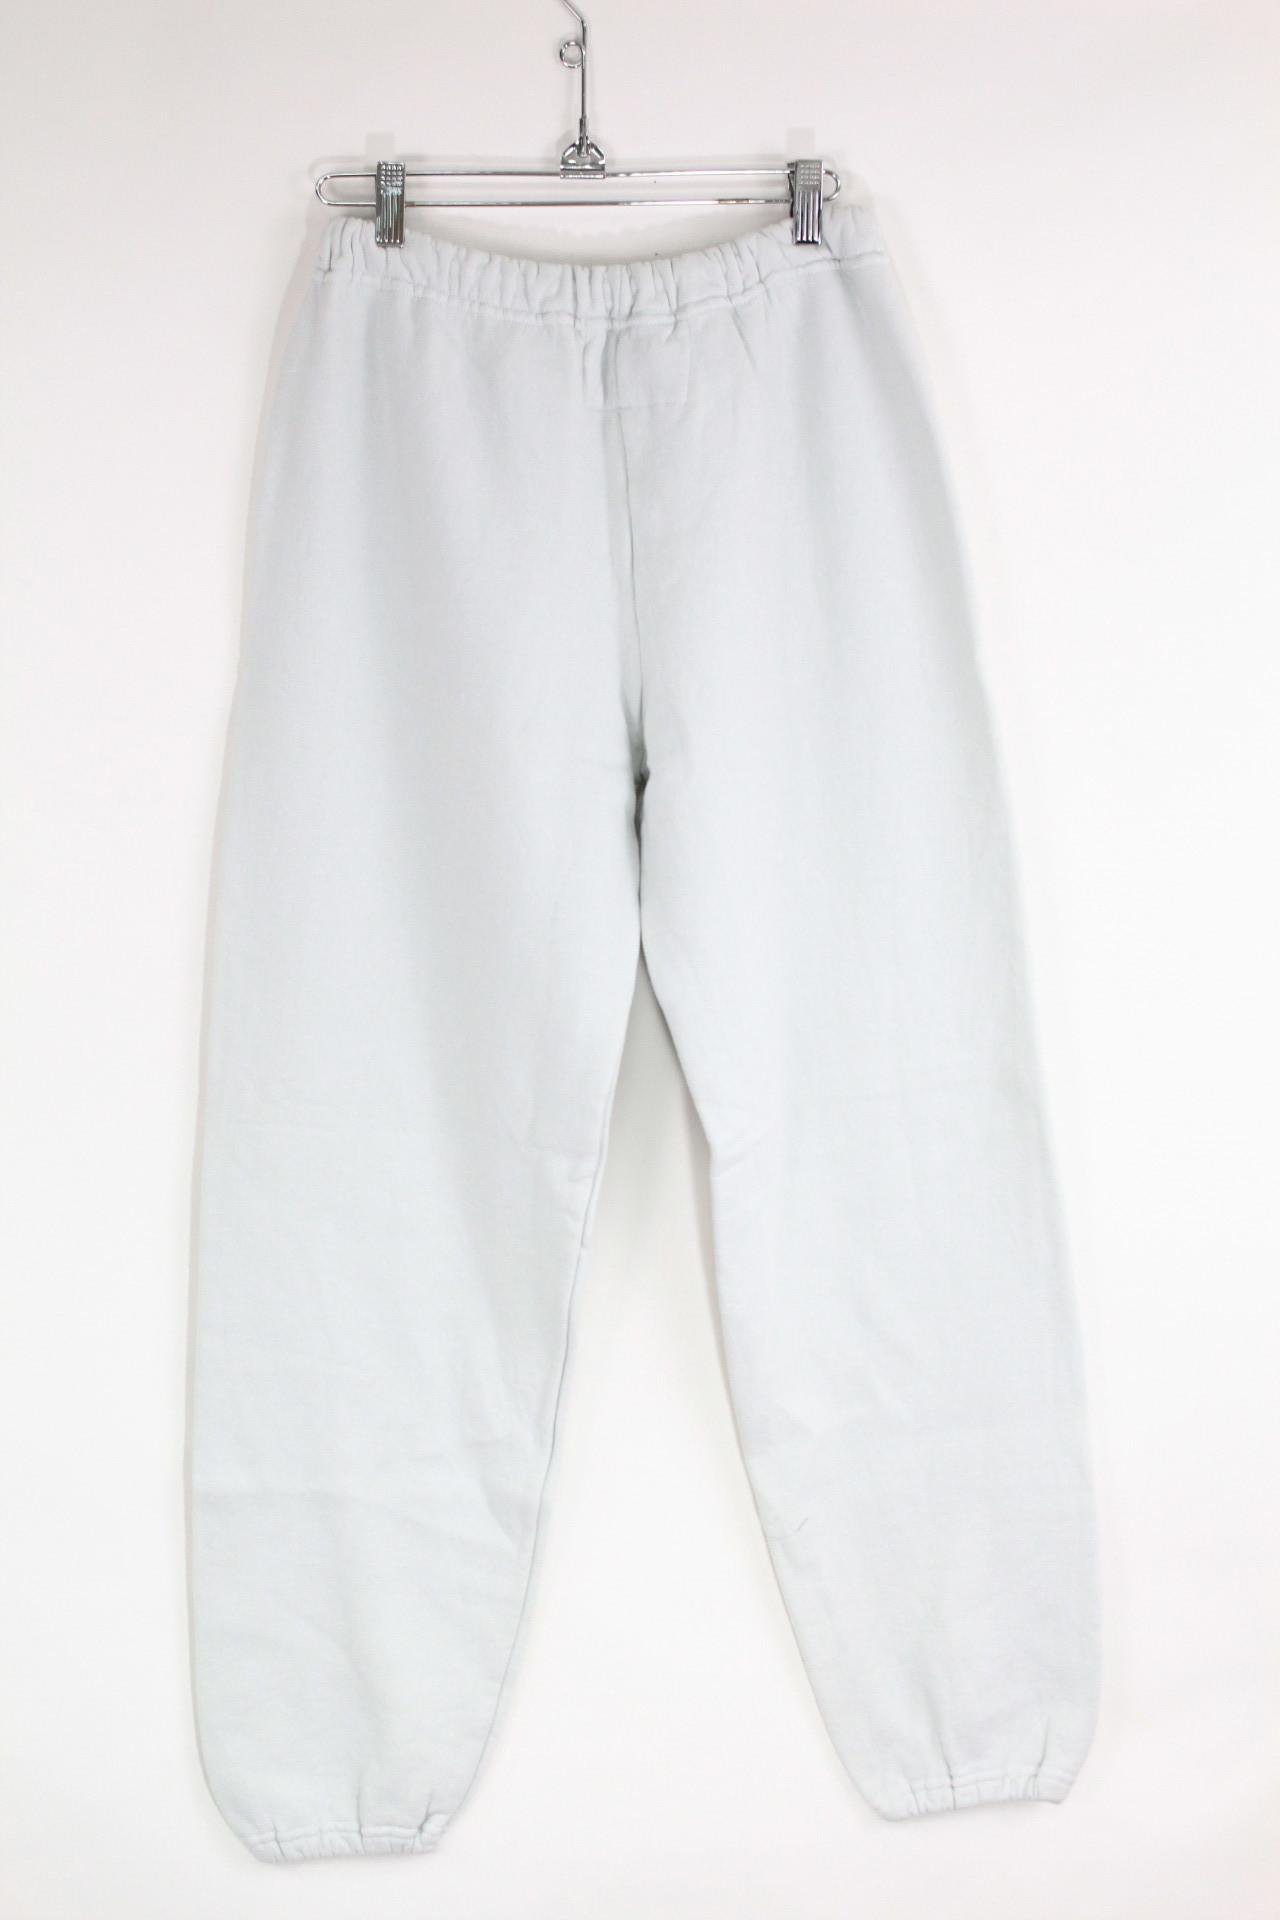 New Free City Womens Loungewear Fleece Freecity Sweatpants Multicolors S-Xl $148